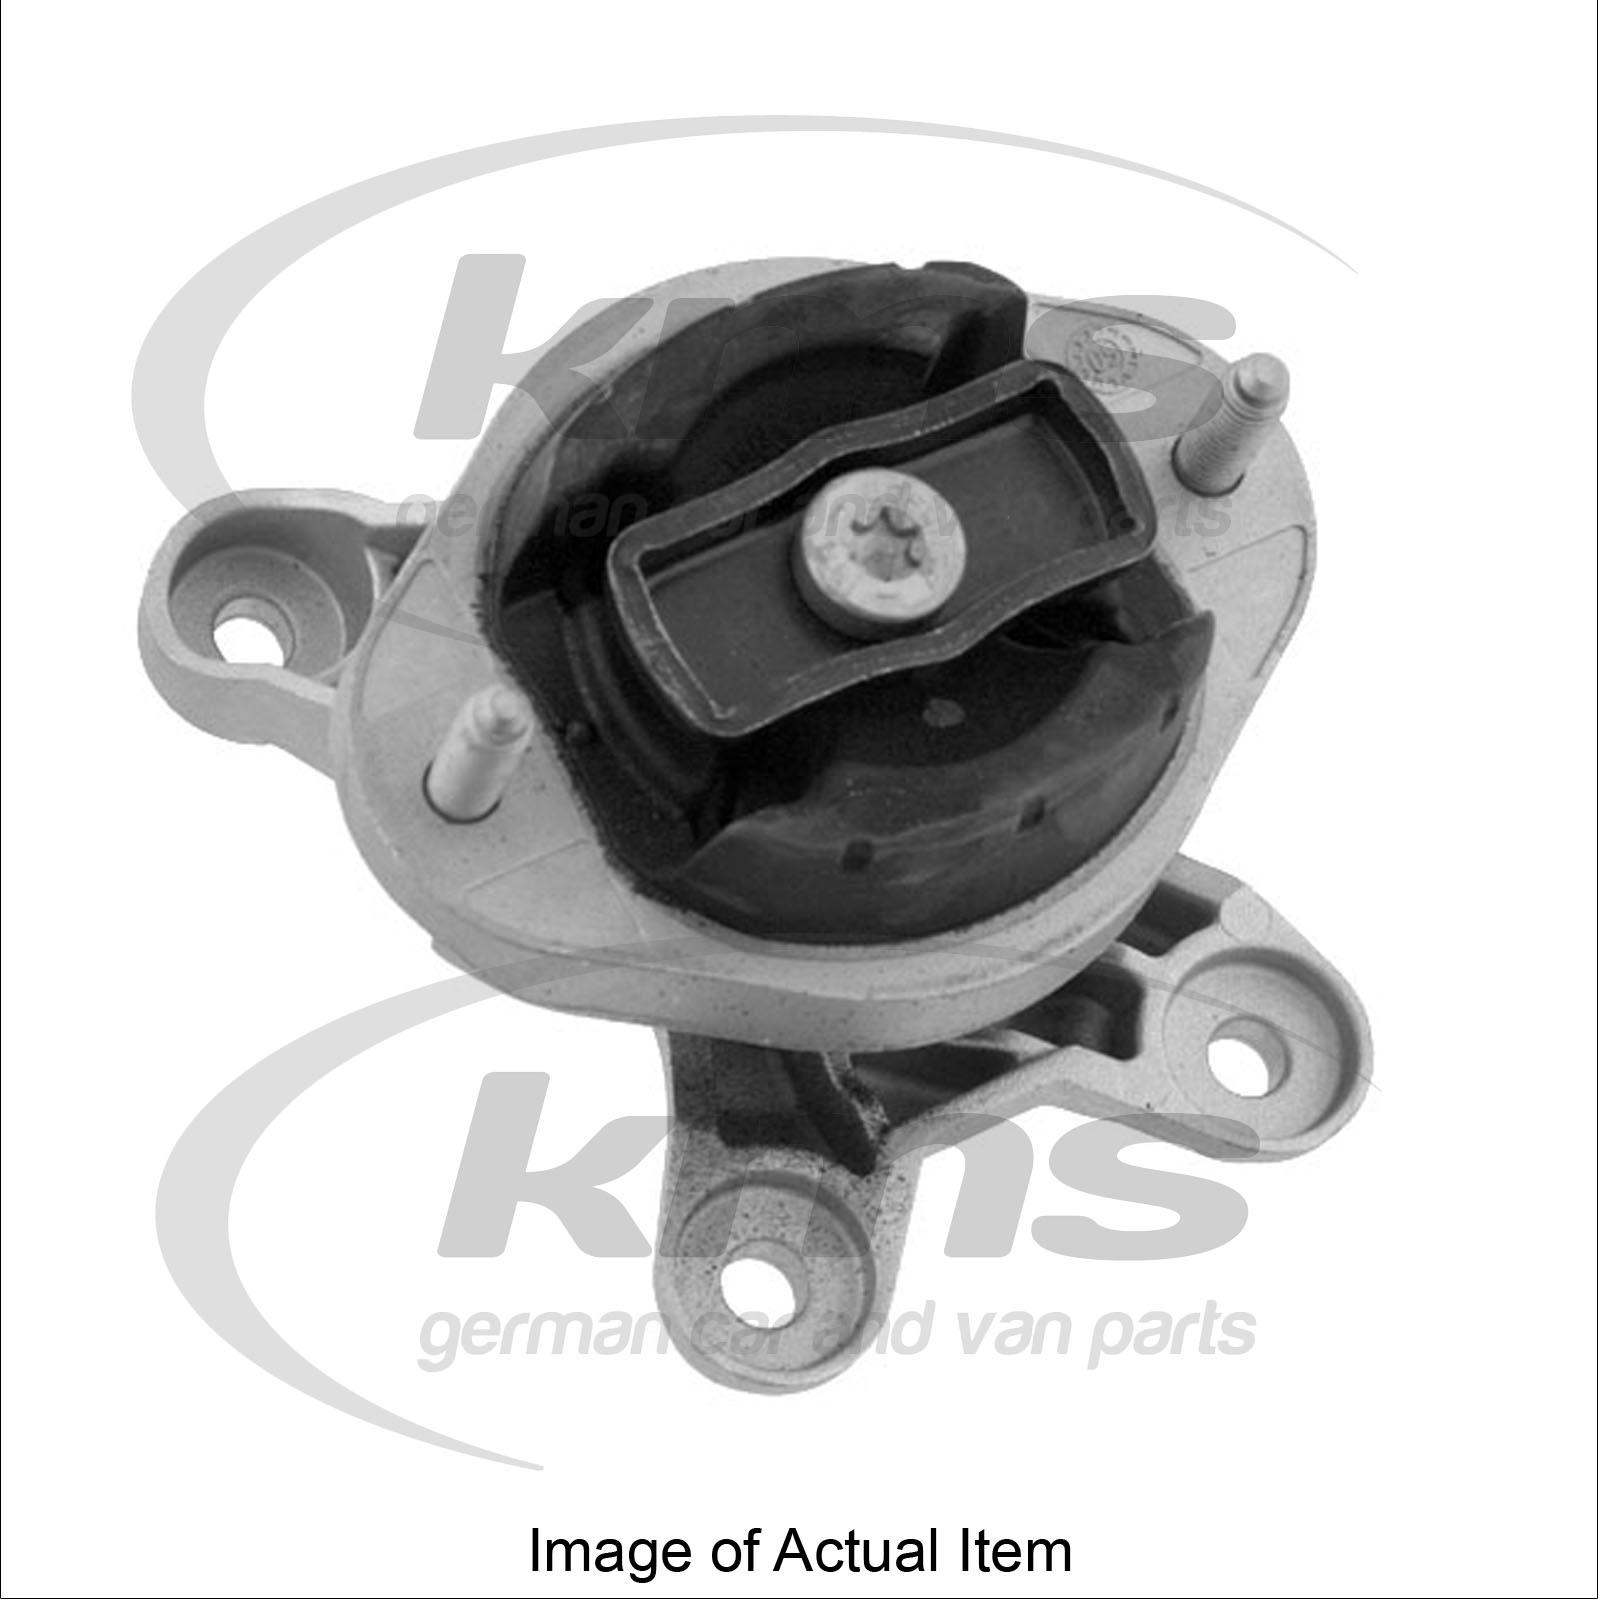 How to Fix Dipped Headlight Error on an Audi  Nicks Car Blog